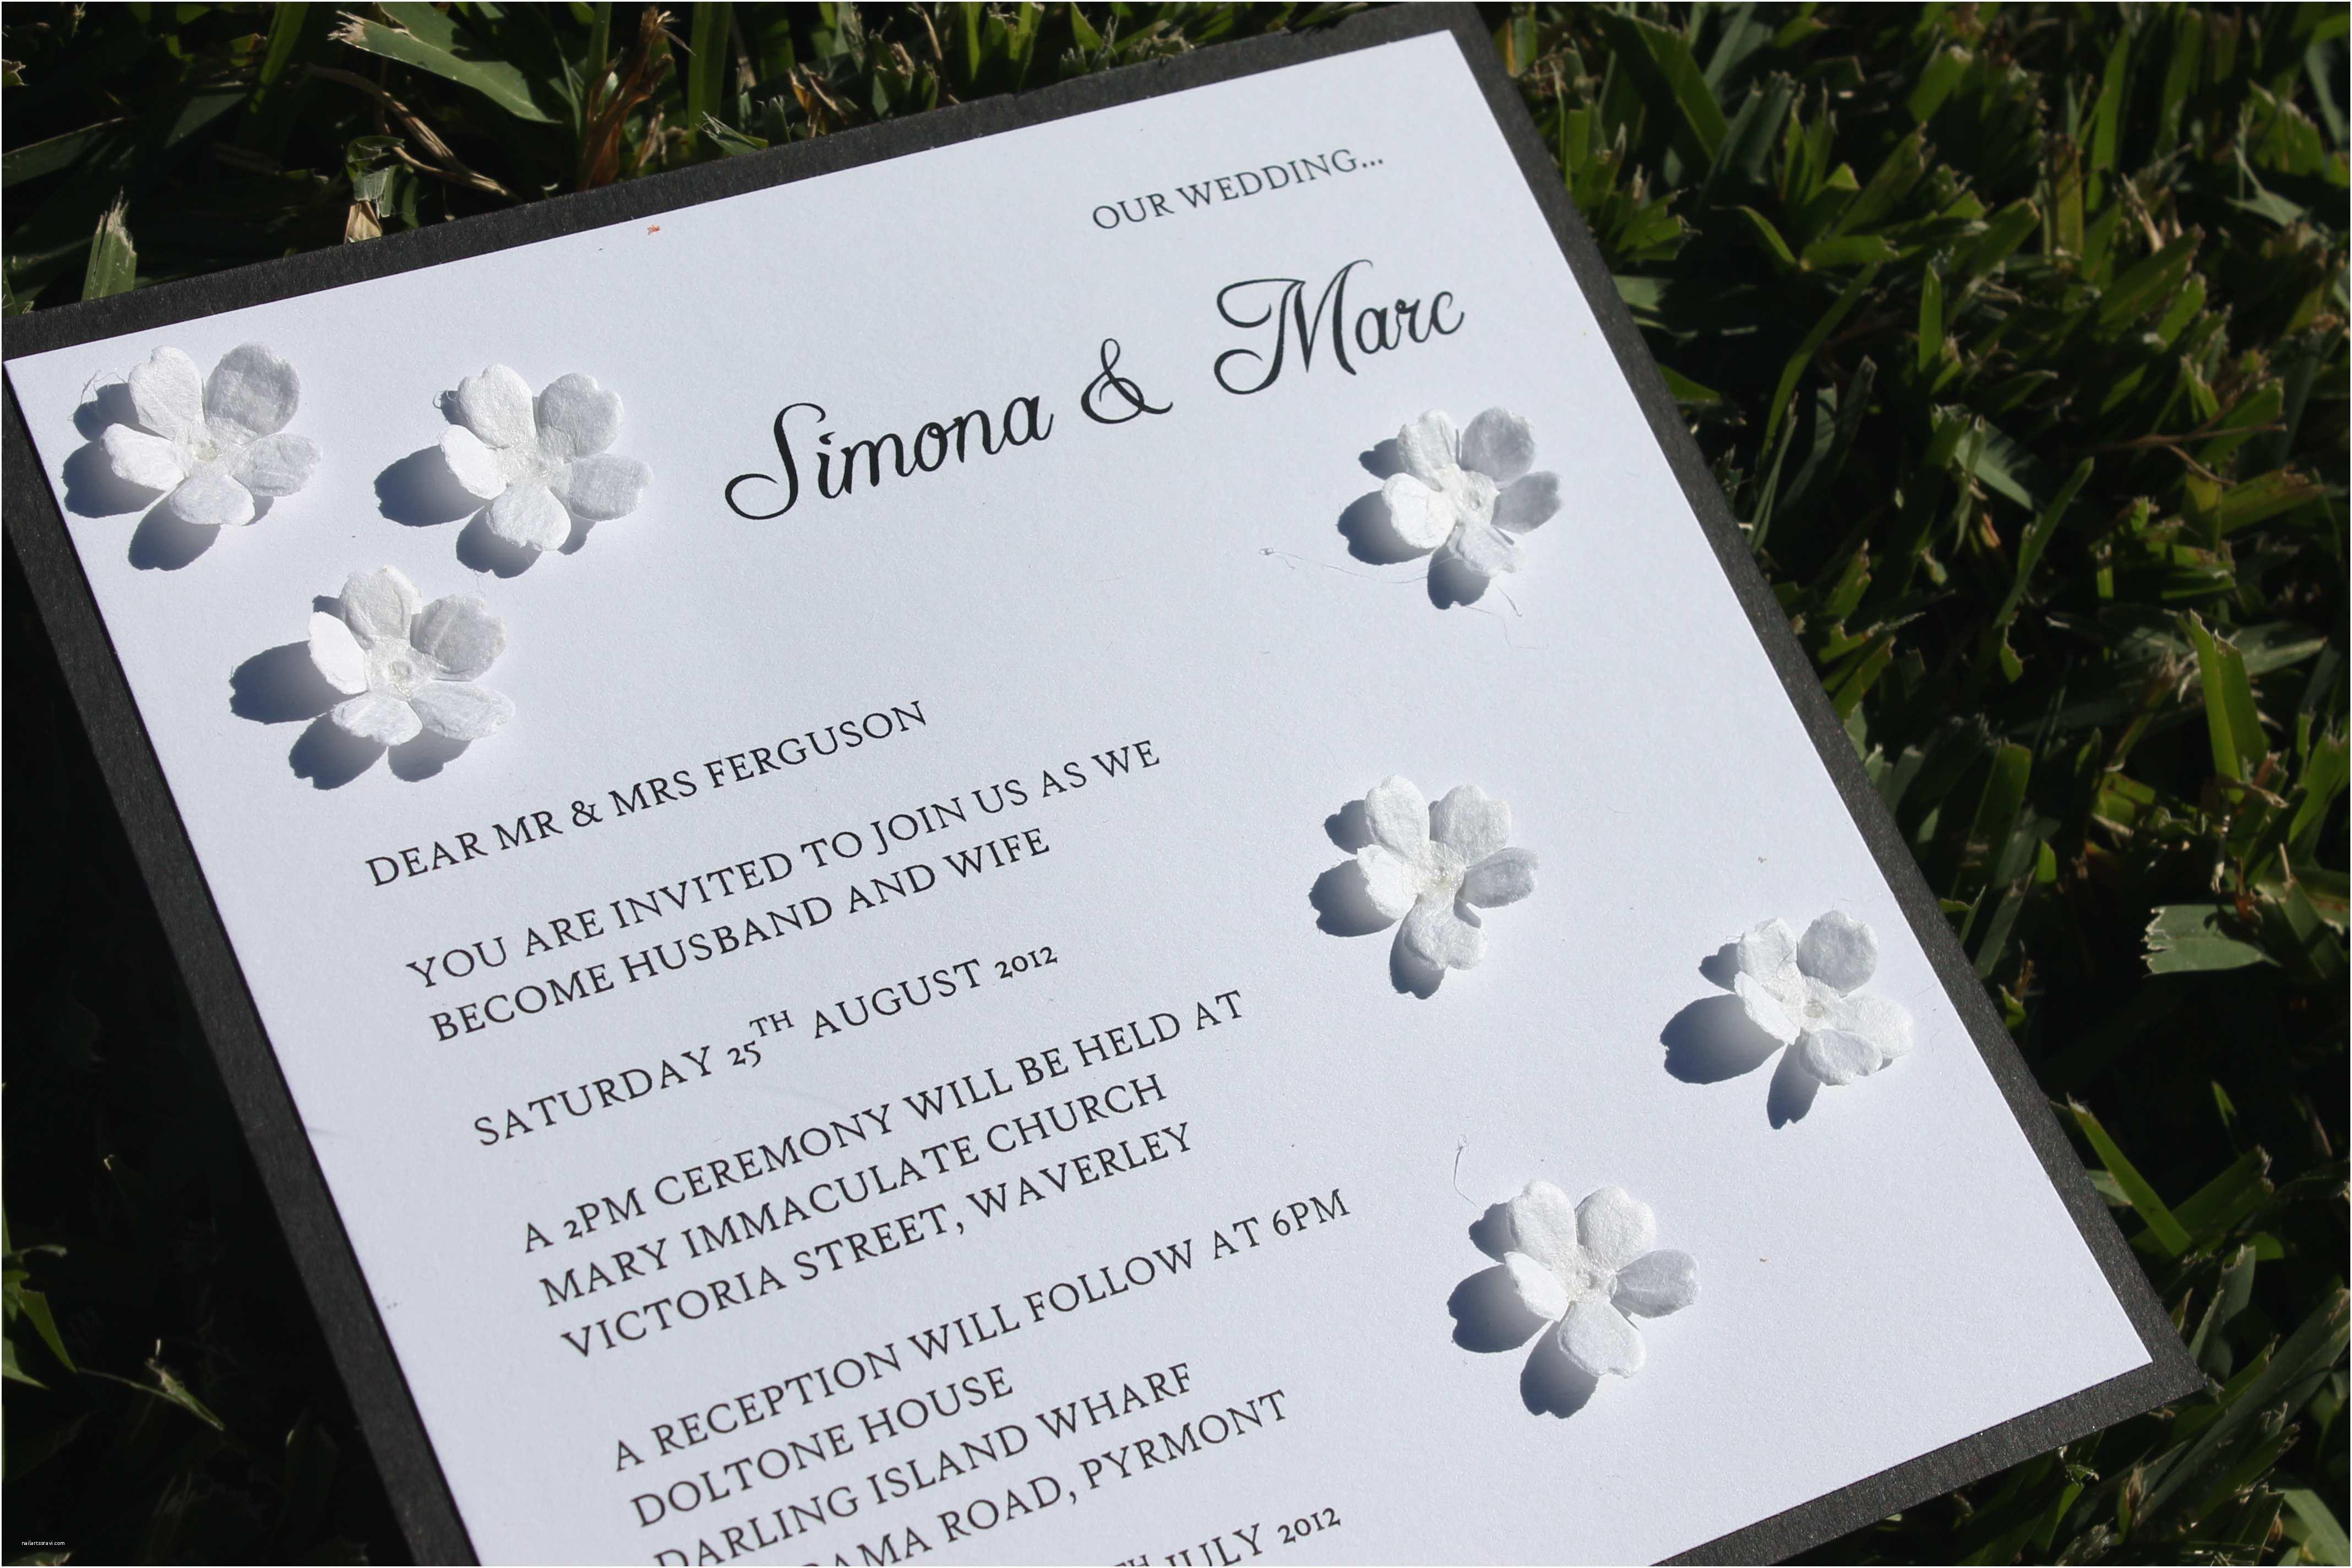 Divorced Parents Wedding Invitation Wedding Invitation Etiquette